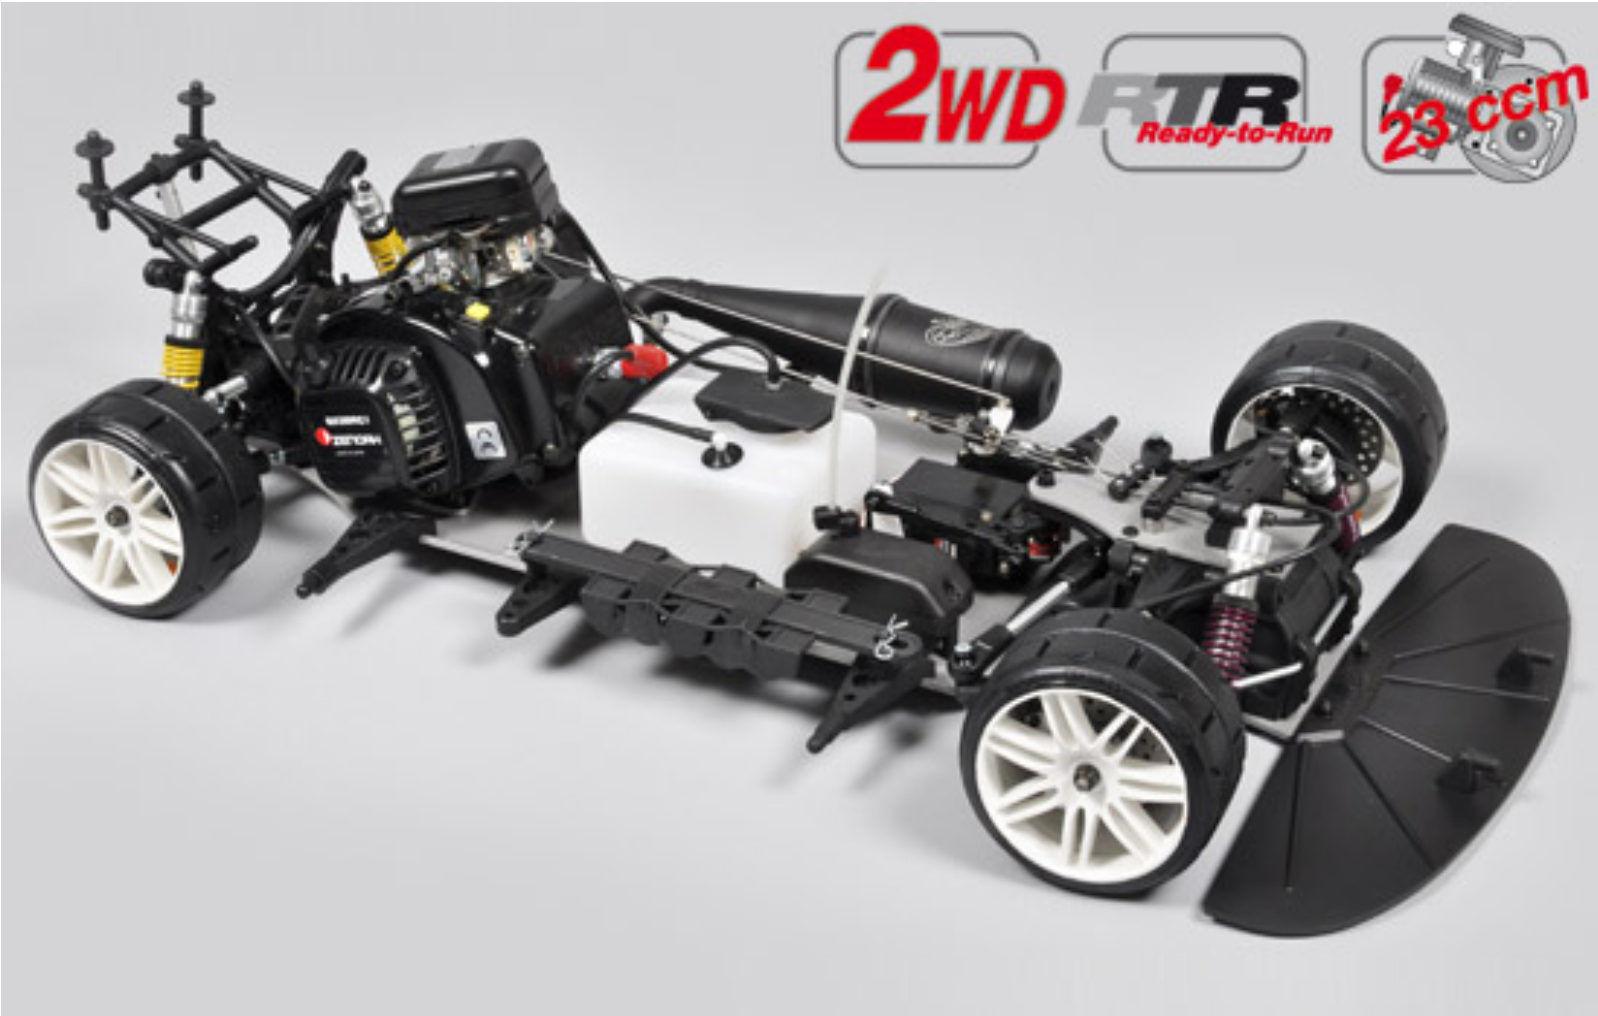 FG modelo Sport r 2 WD 530 chasis con bmw m3 carrocería 23 ccm rtr